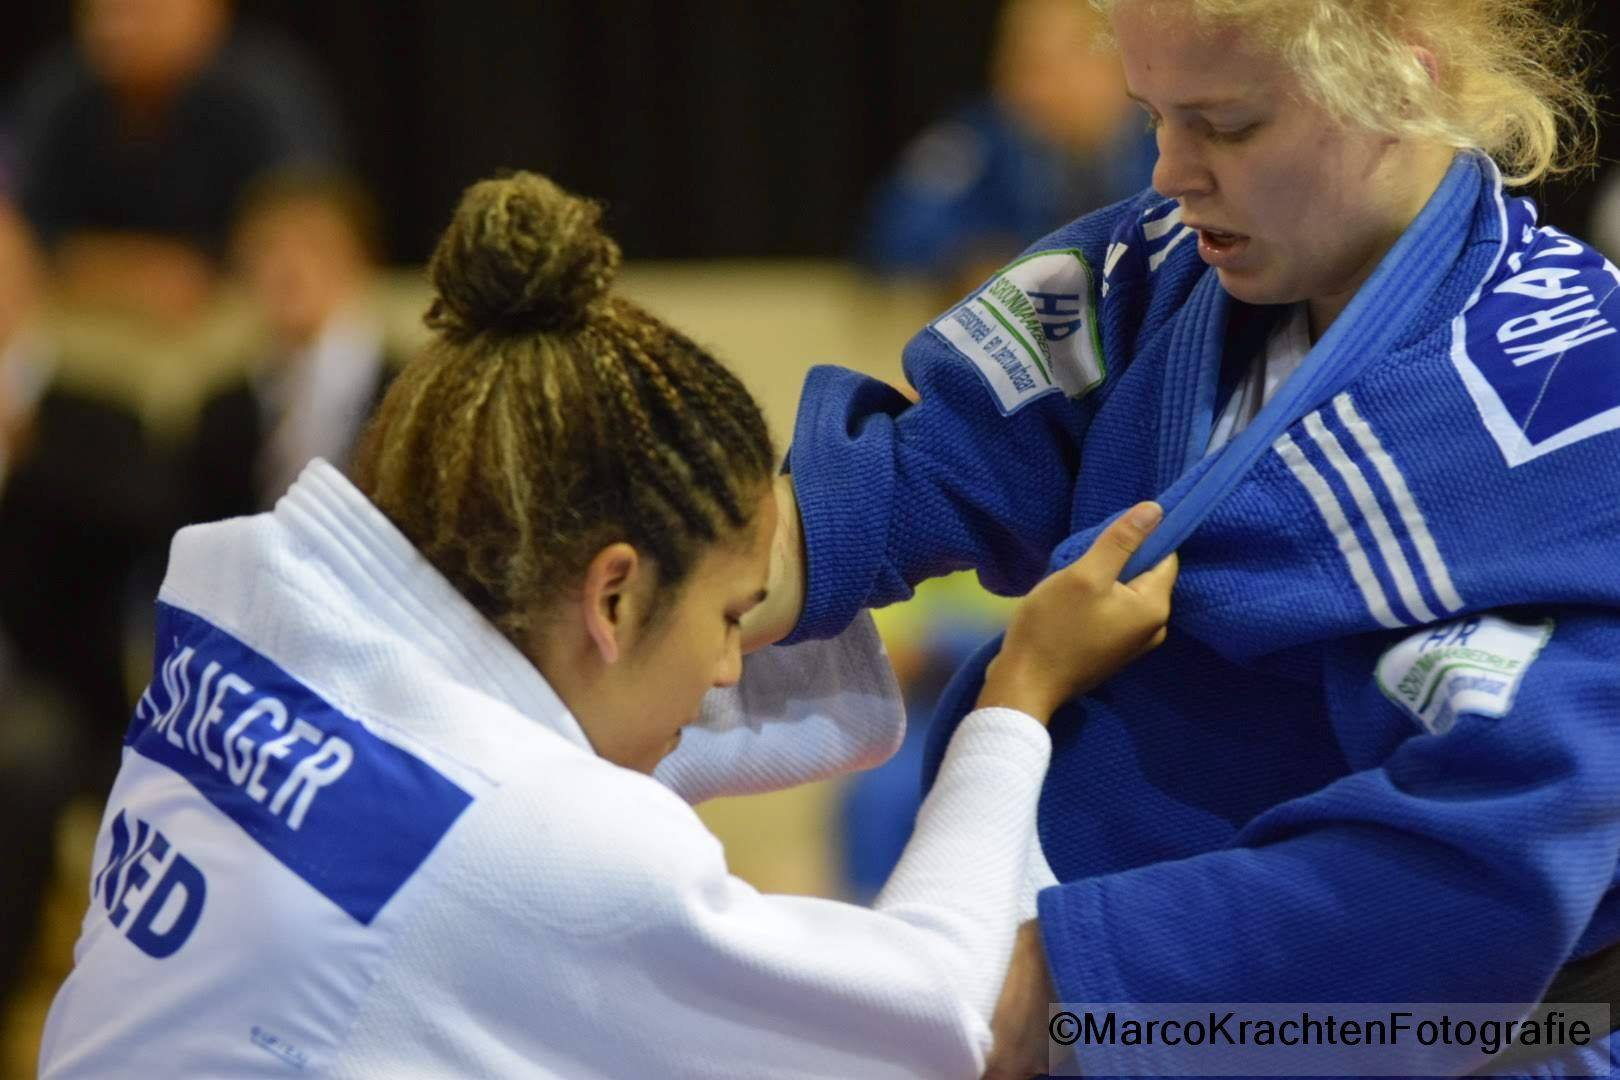 Uitgebreide fotoreportage NKT Judo Almere 8 september 2018